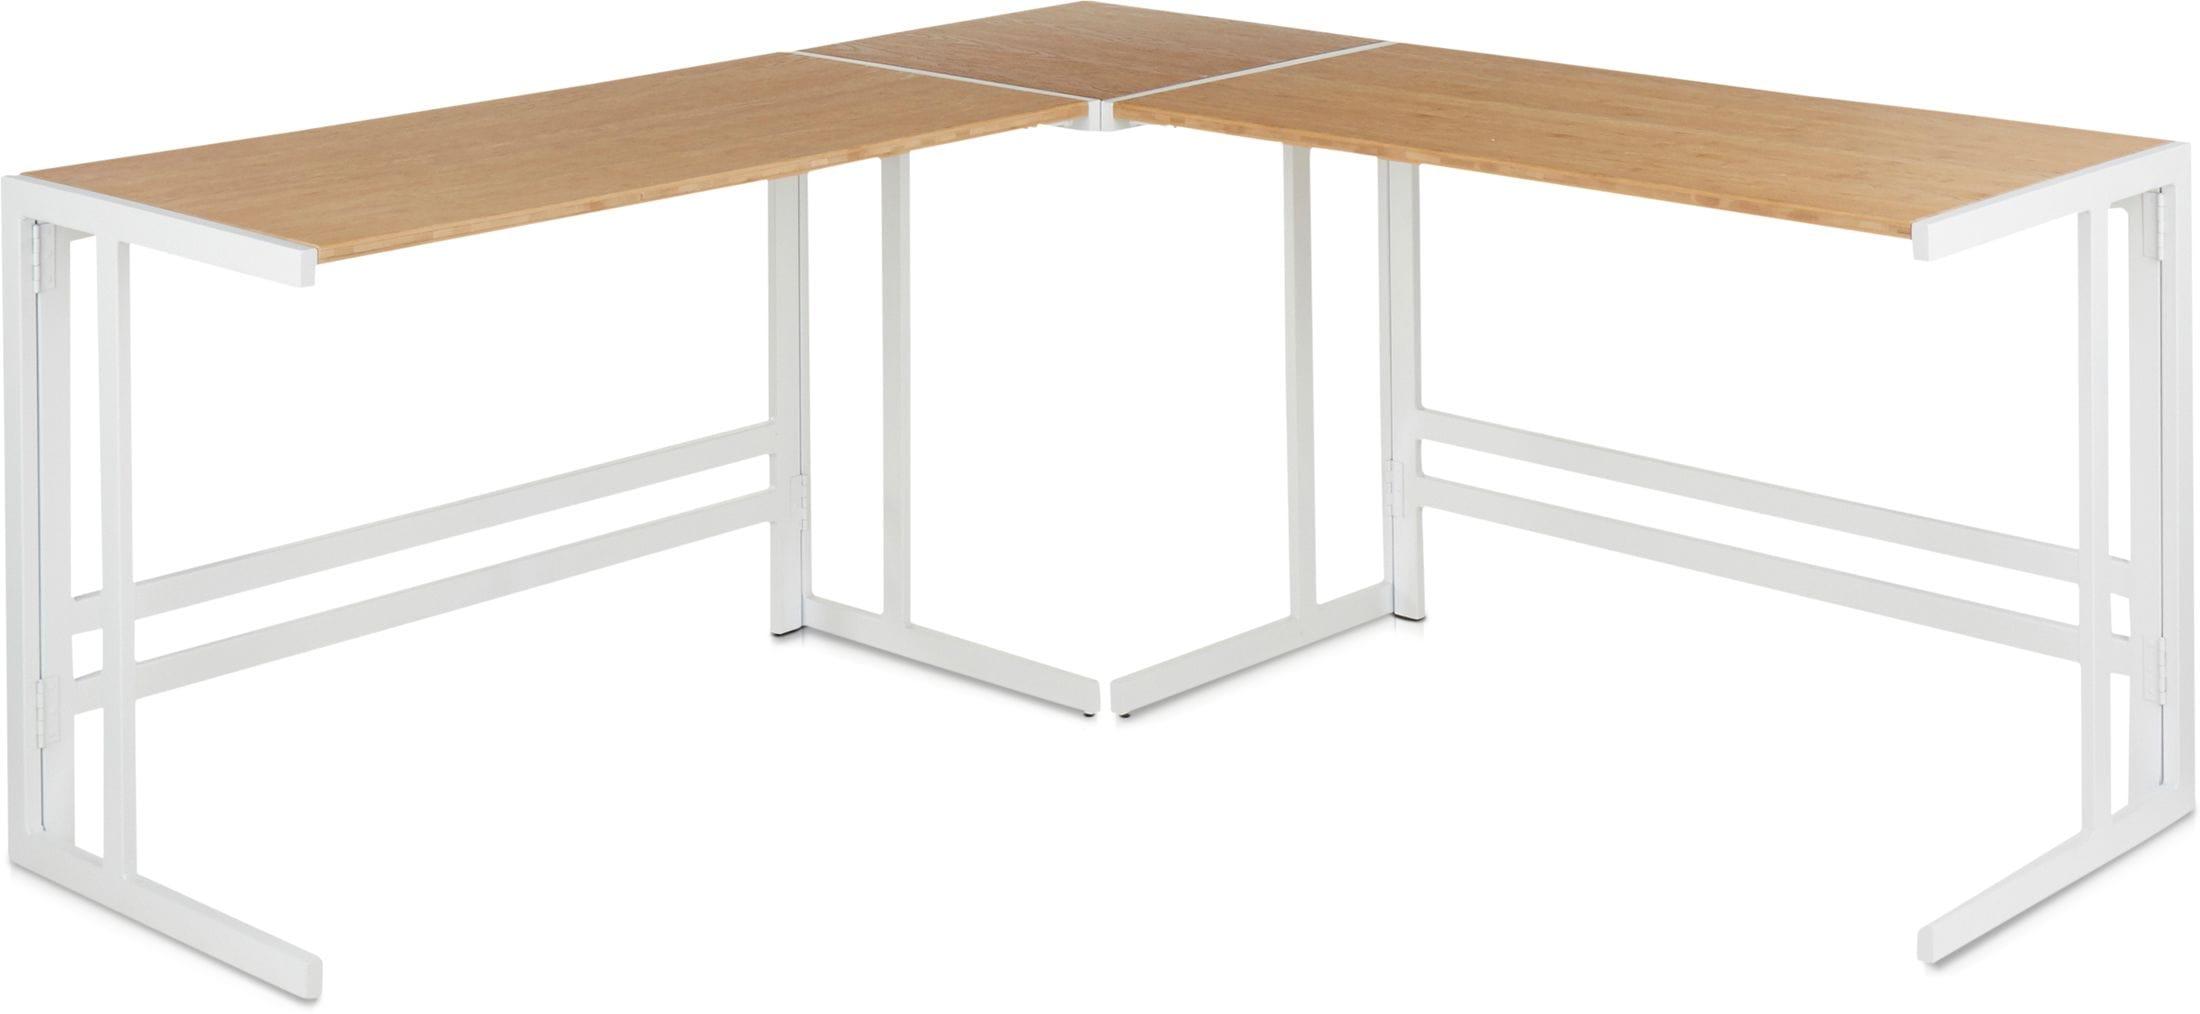 Home Office Furniture - Miles L-Shaped Desk